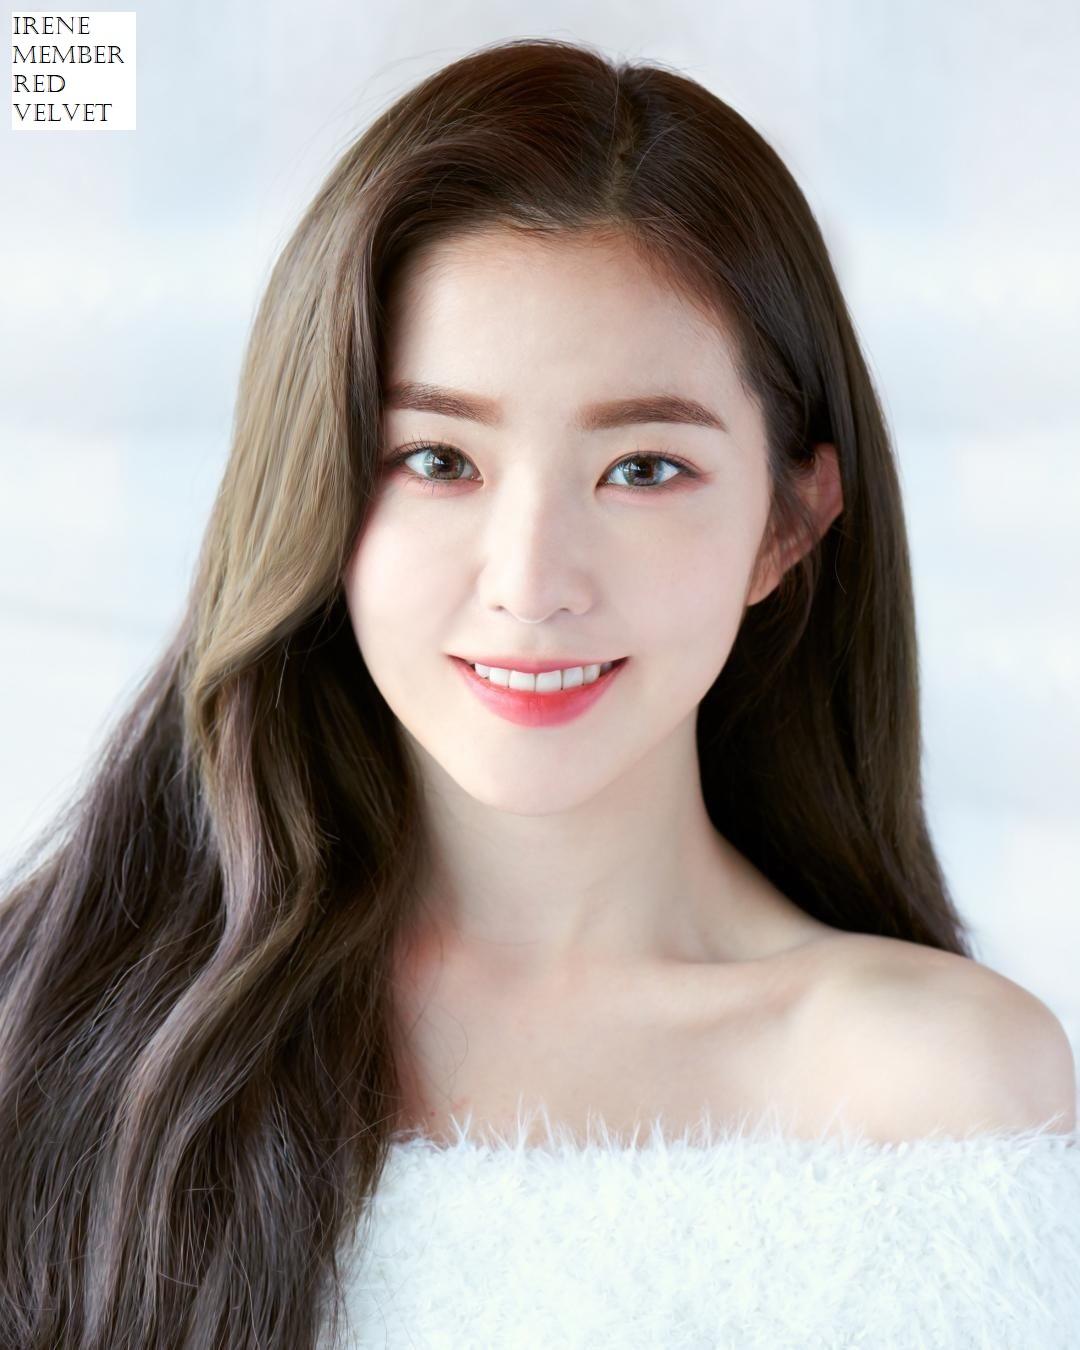 Isu Terbaru Irene Member Red Velvet